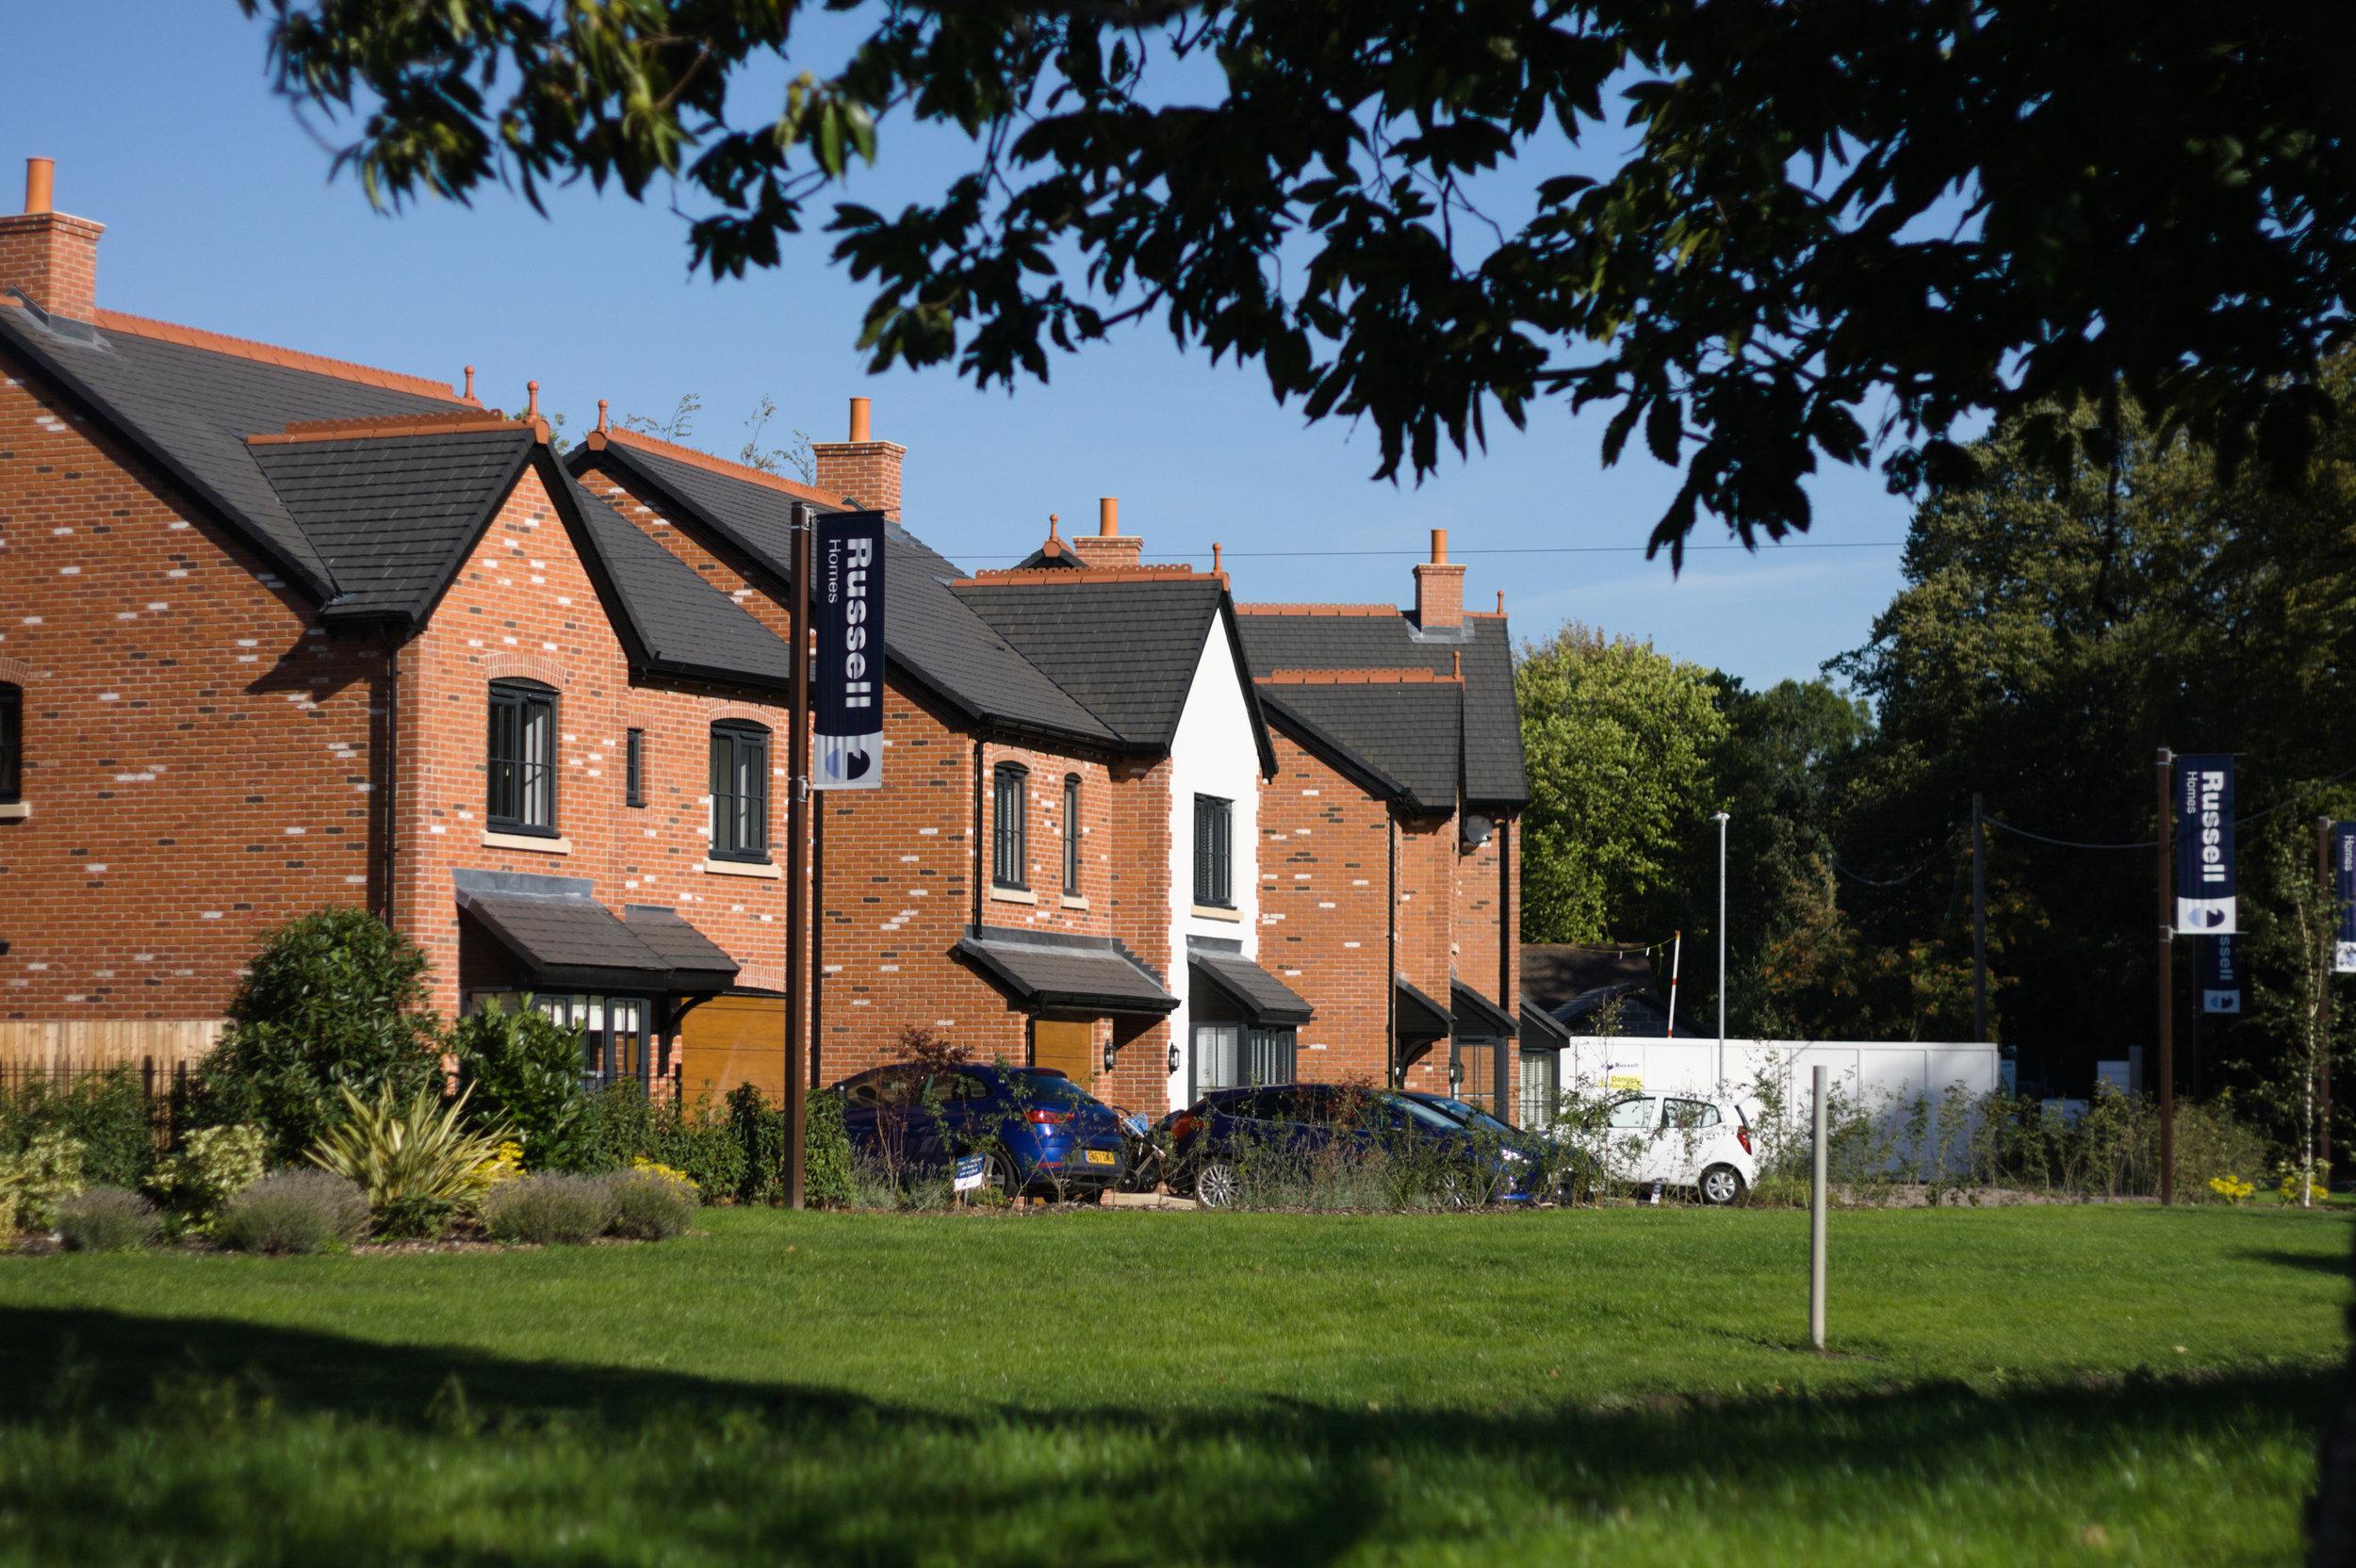 Saltersford Gardens, Holmes Chapel